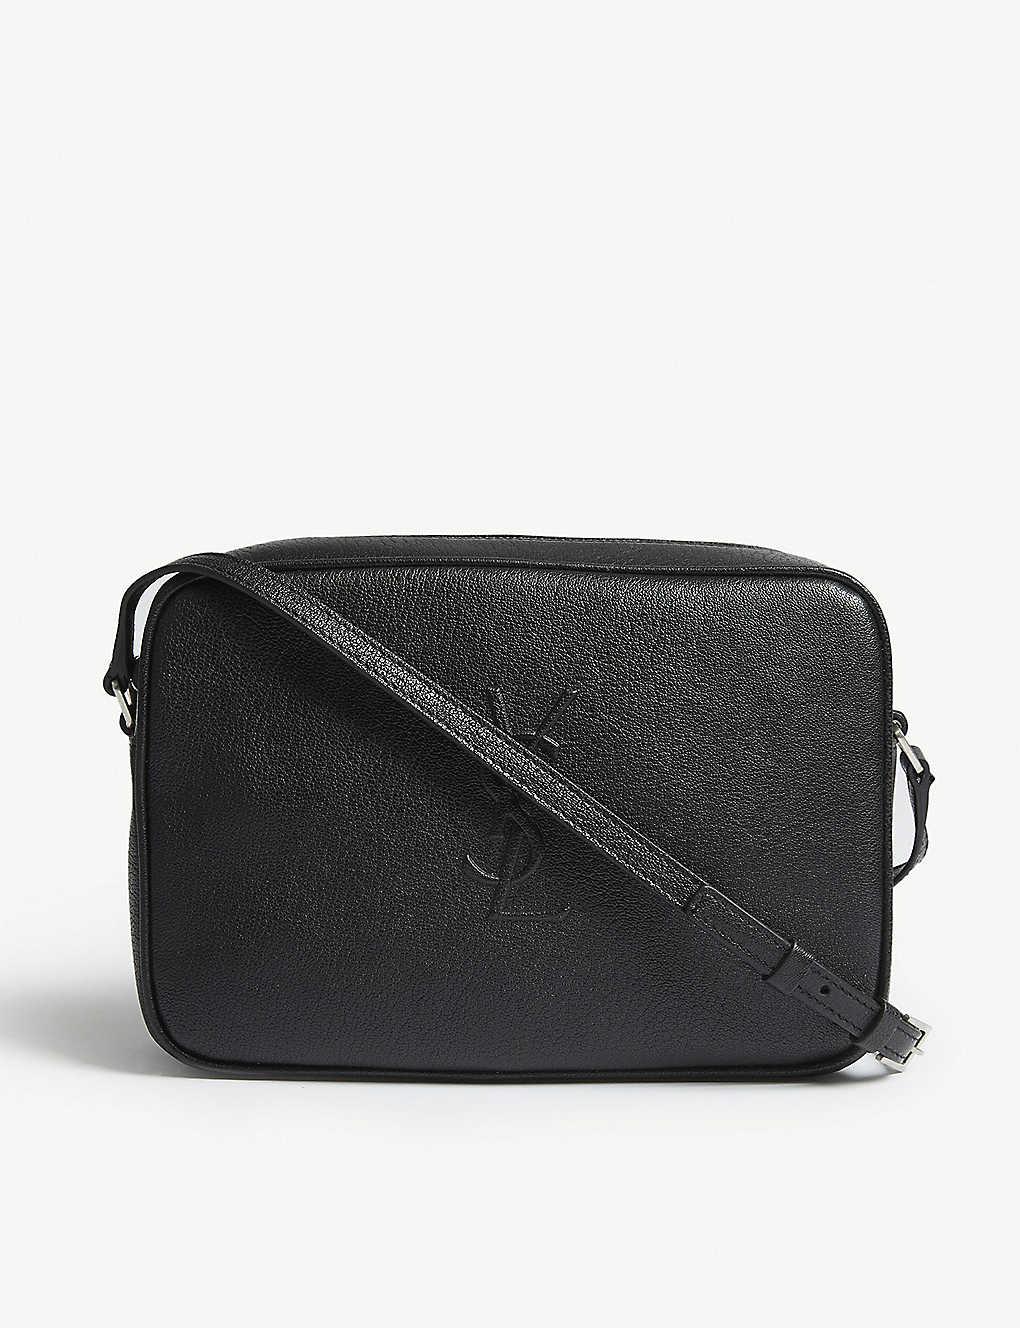 5cb338721db SAINT LAURENT - Mono Lou leather camera bag | Selfridges.com